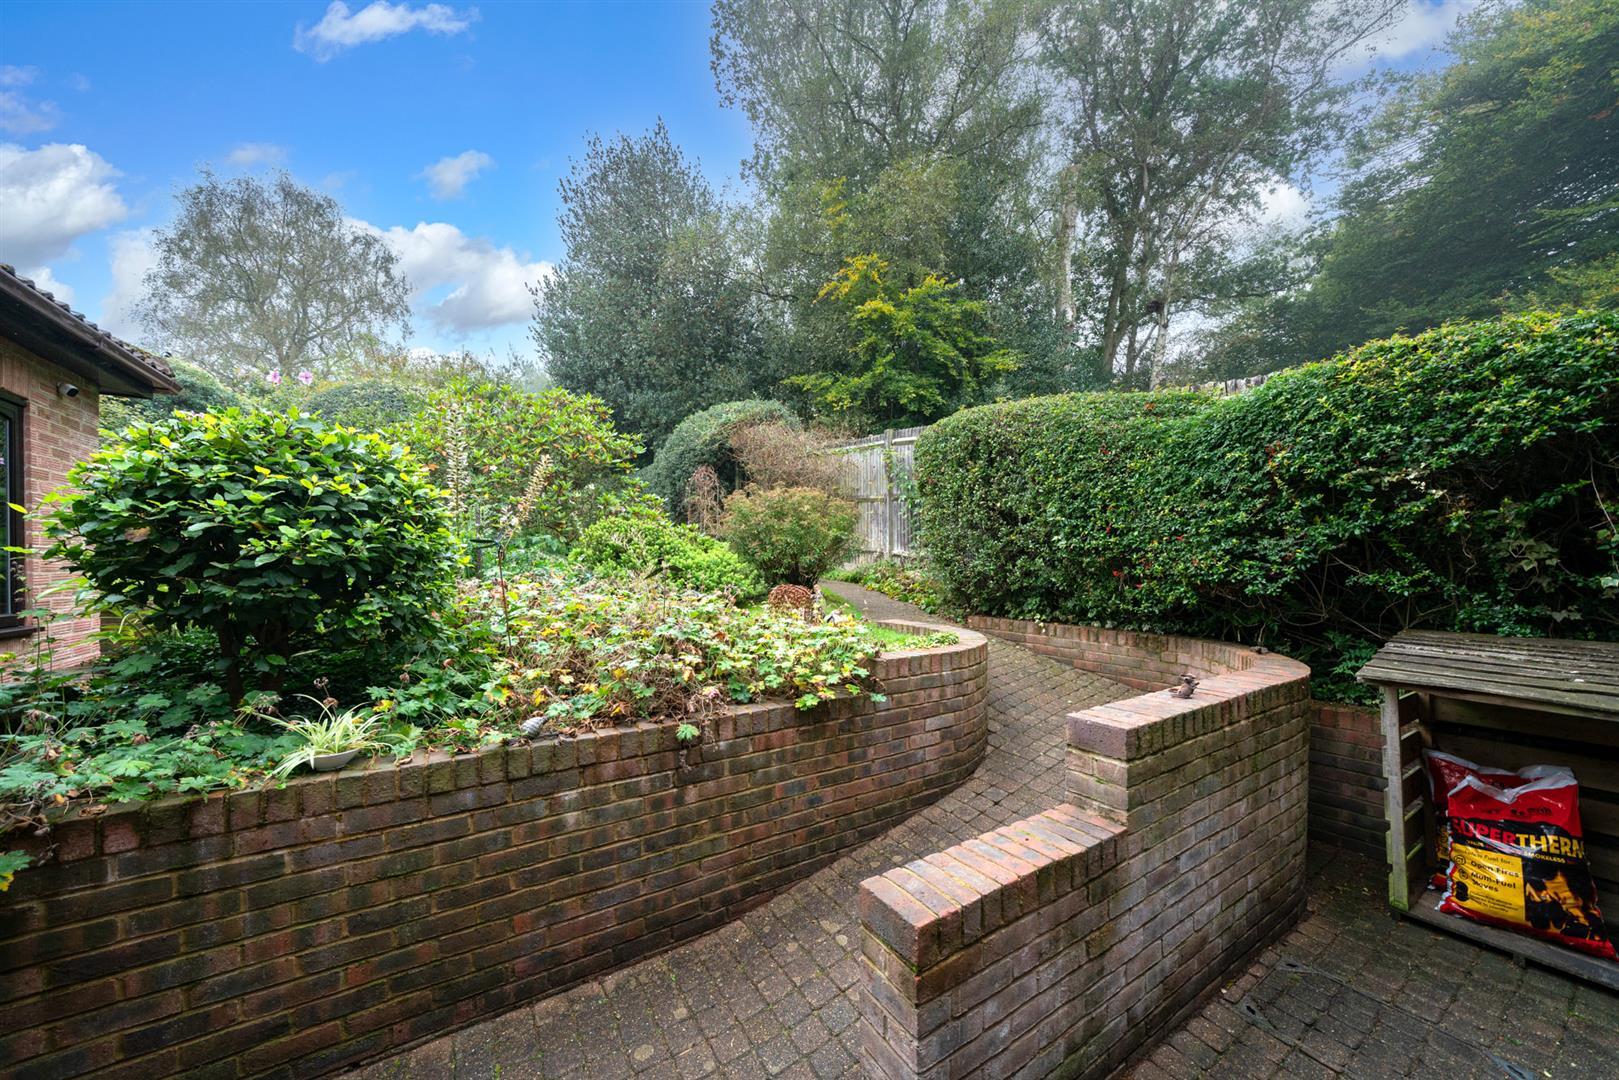 Boundary-Edge-15- garden patio area.jpg